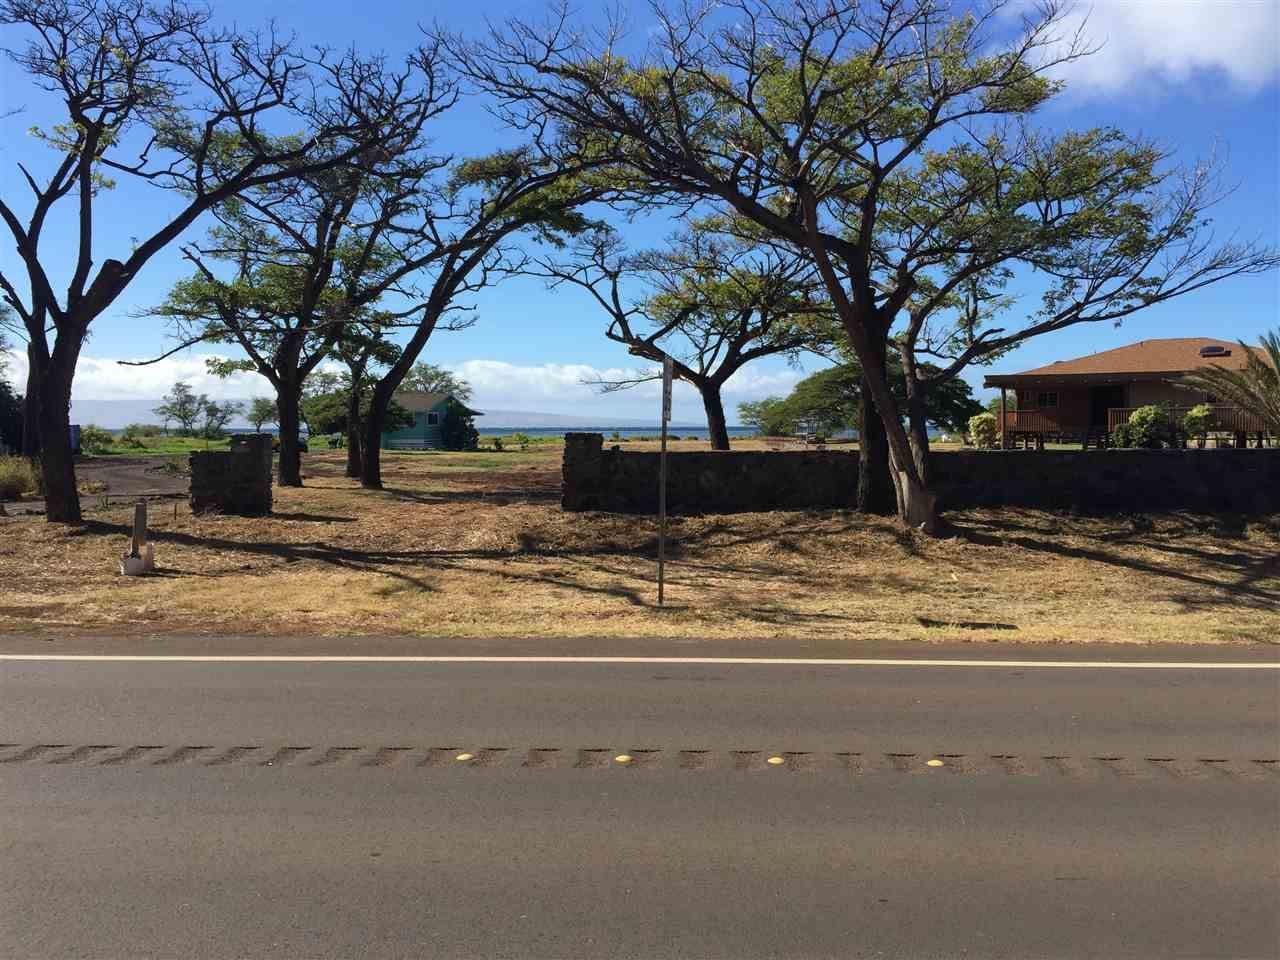 Photo of 2904 Kamehameha V Hwy, Kaunakakai, HI 96748 (MLS # 390916)